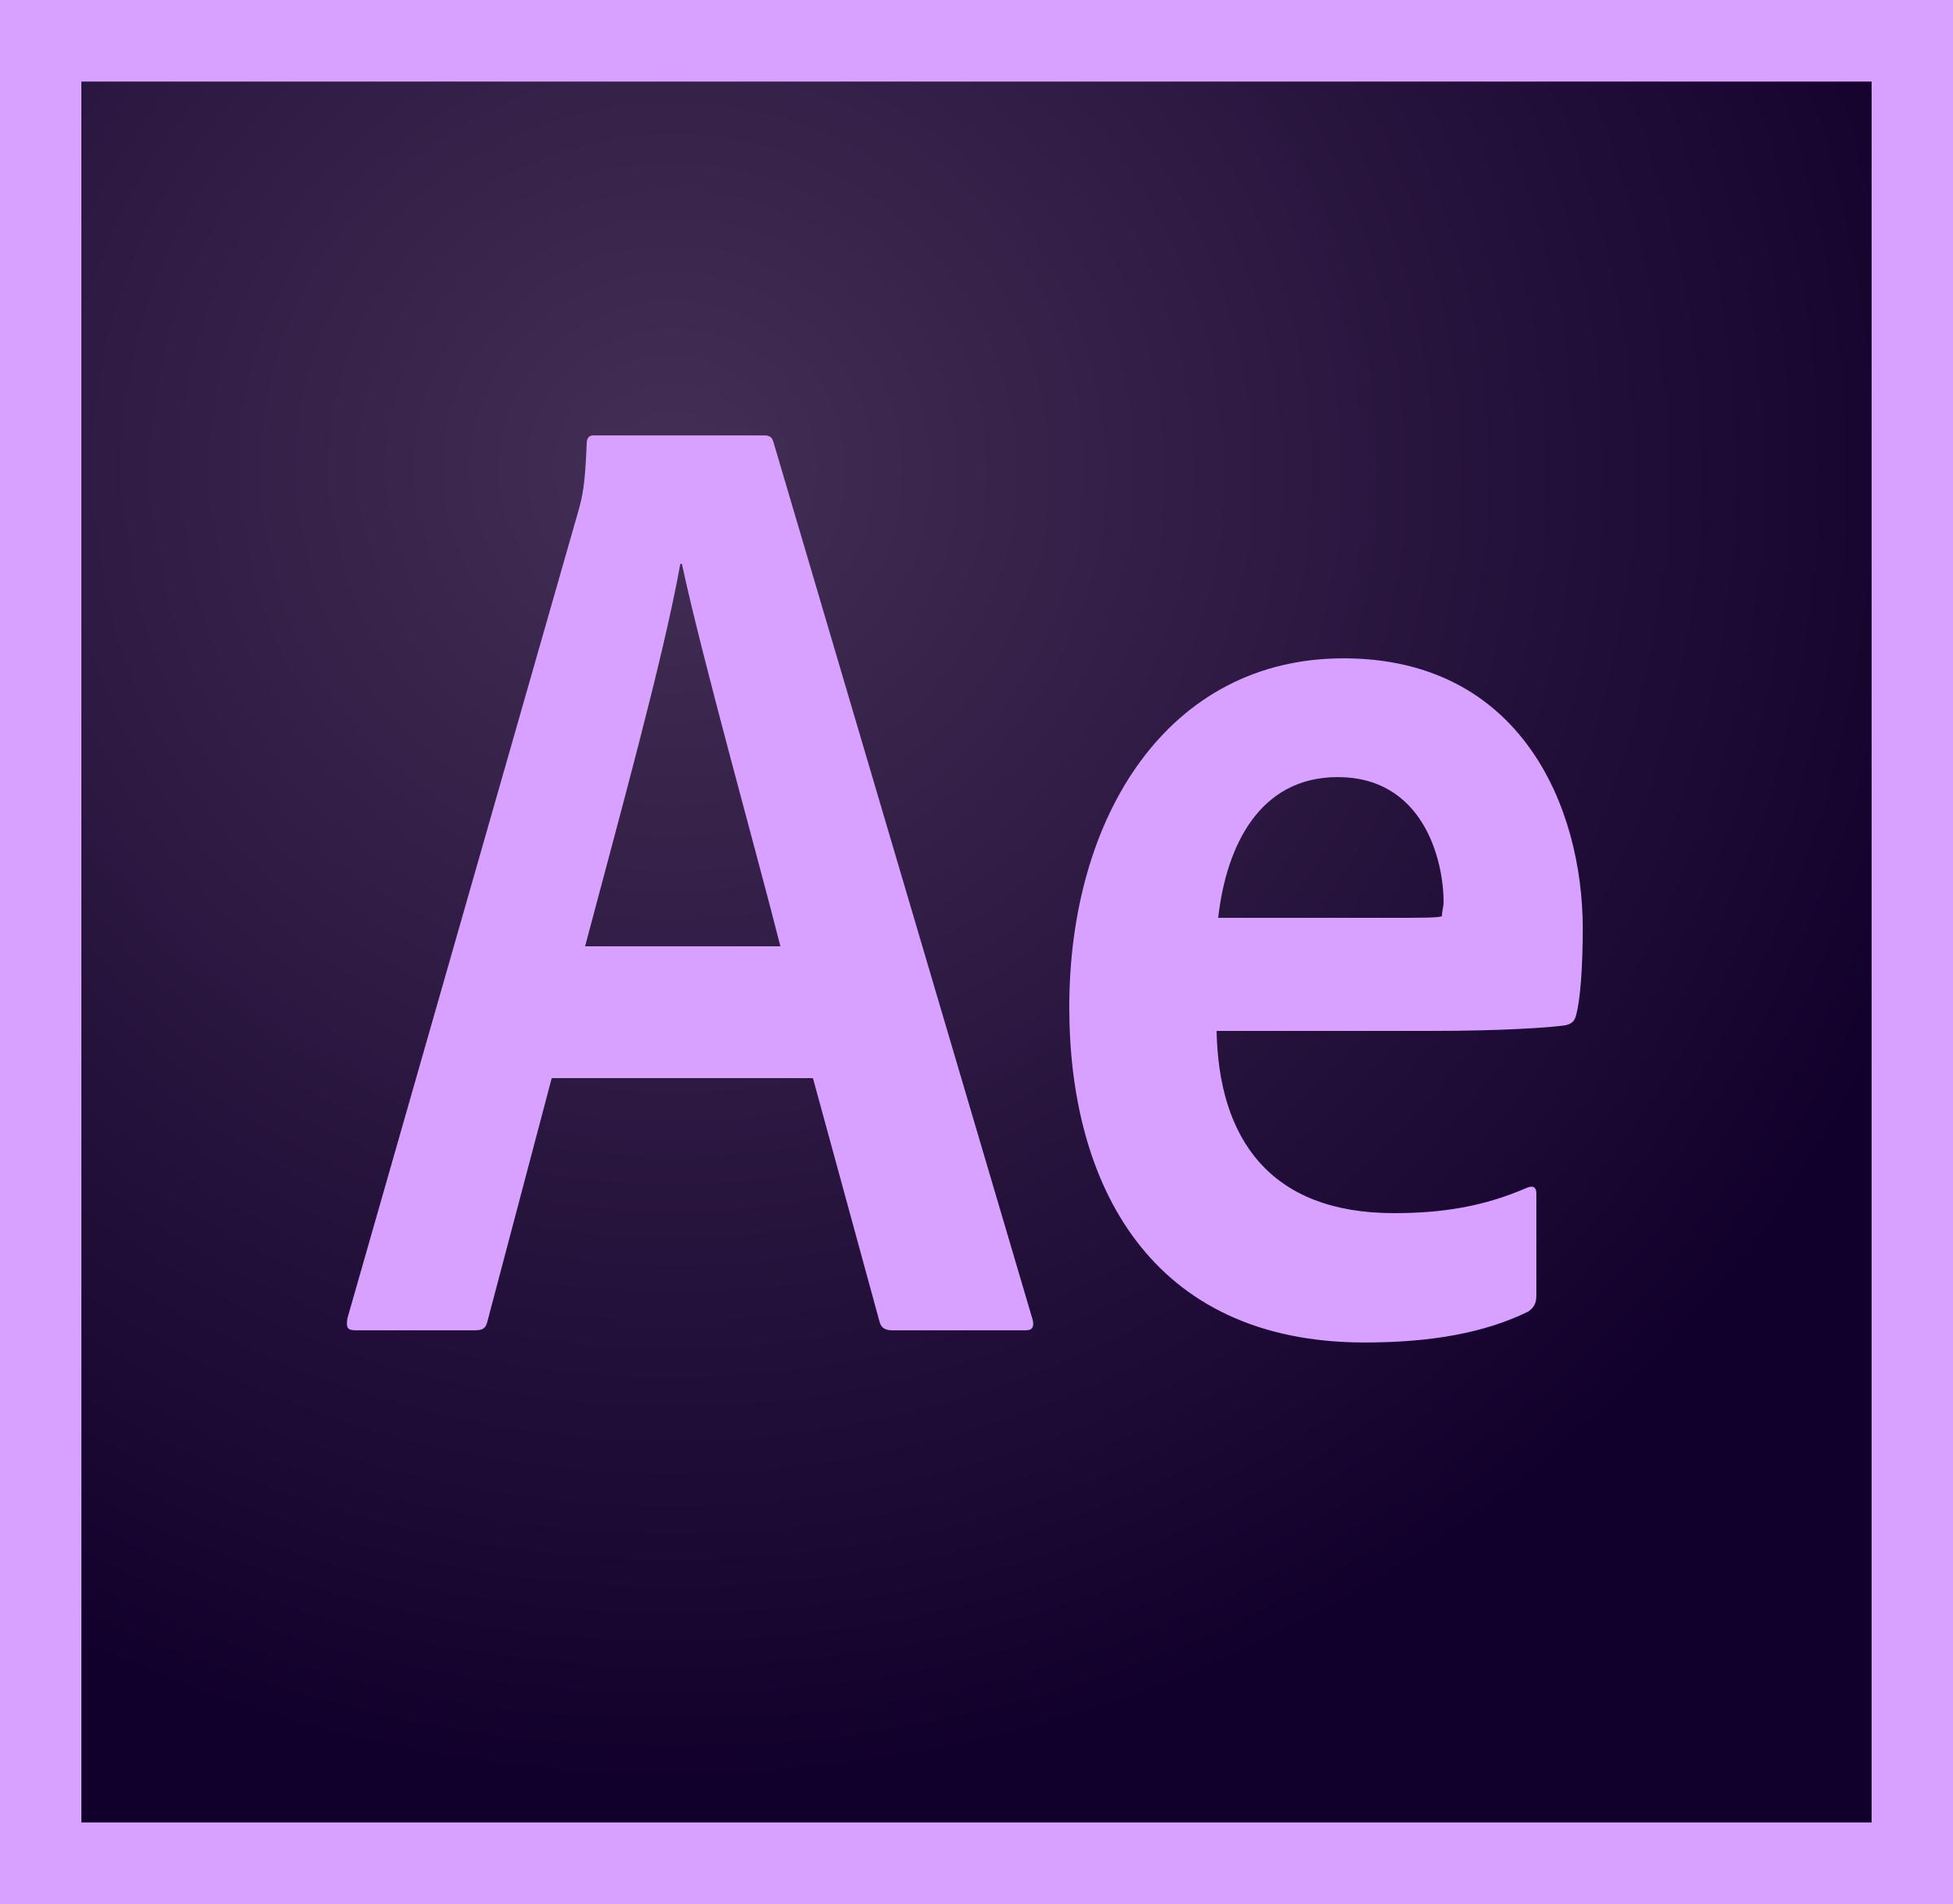 After Effects CC Logo PNG Transparent & SVG Vector.